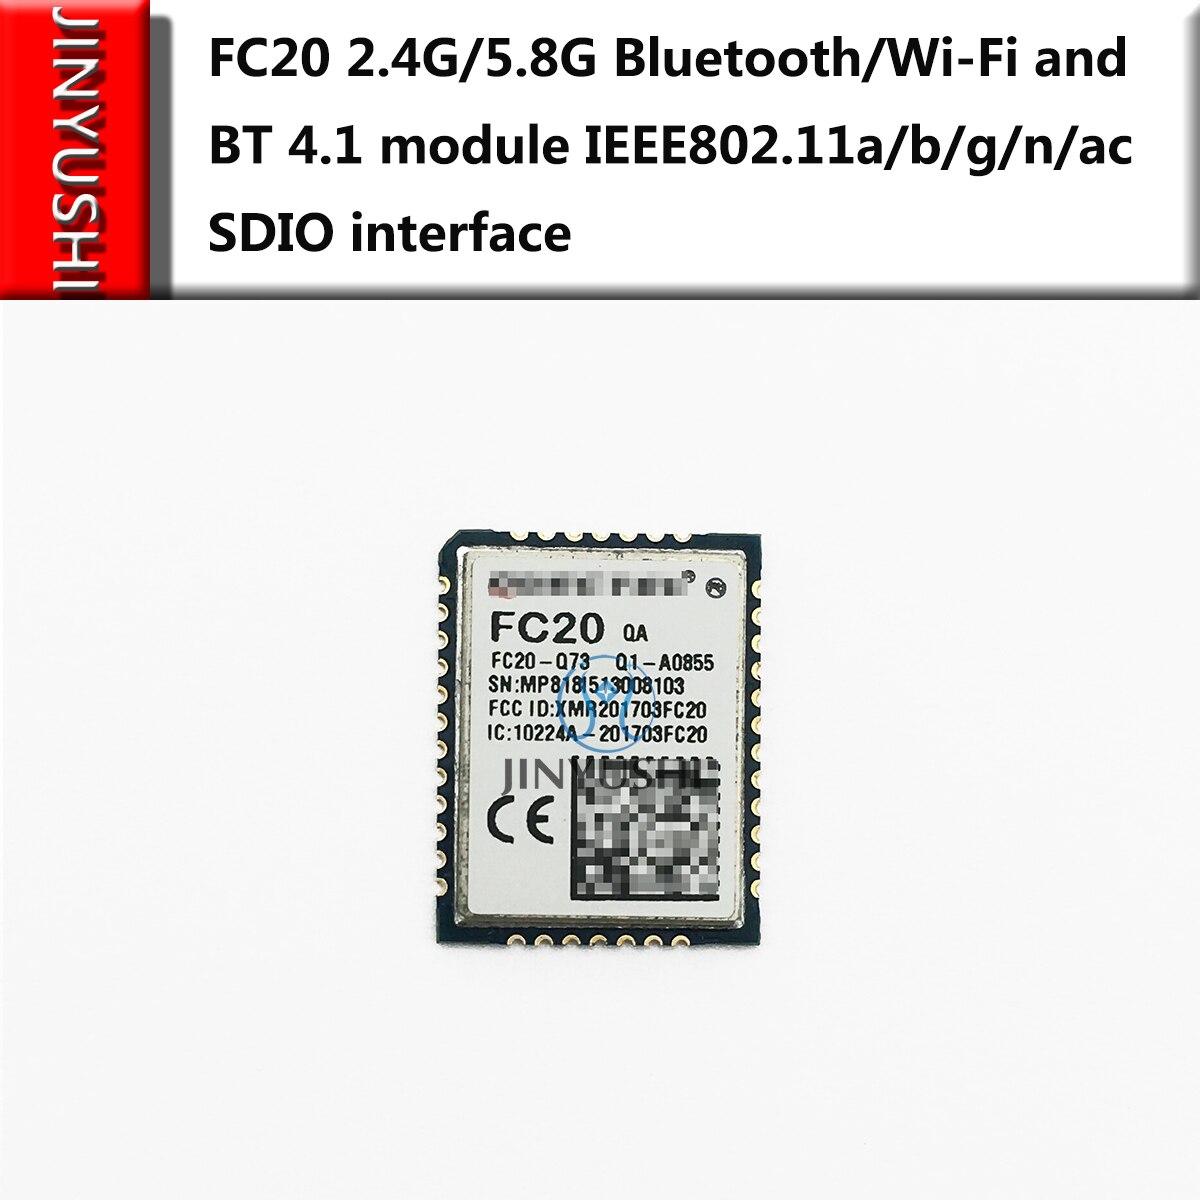 2pcs JINYUSHI For Quecte FC20 2.4G/5.8G Bluetooth/Wi-Fi And BT 4.1 Module IEEE802.11a/b/g/n/ac SDIO Interface  New&Original